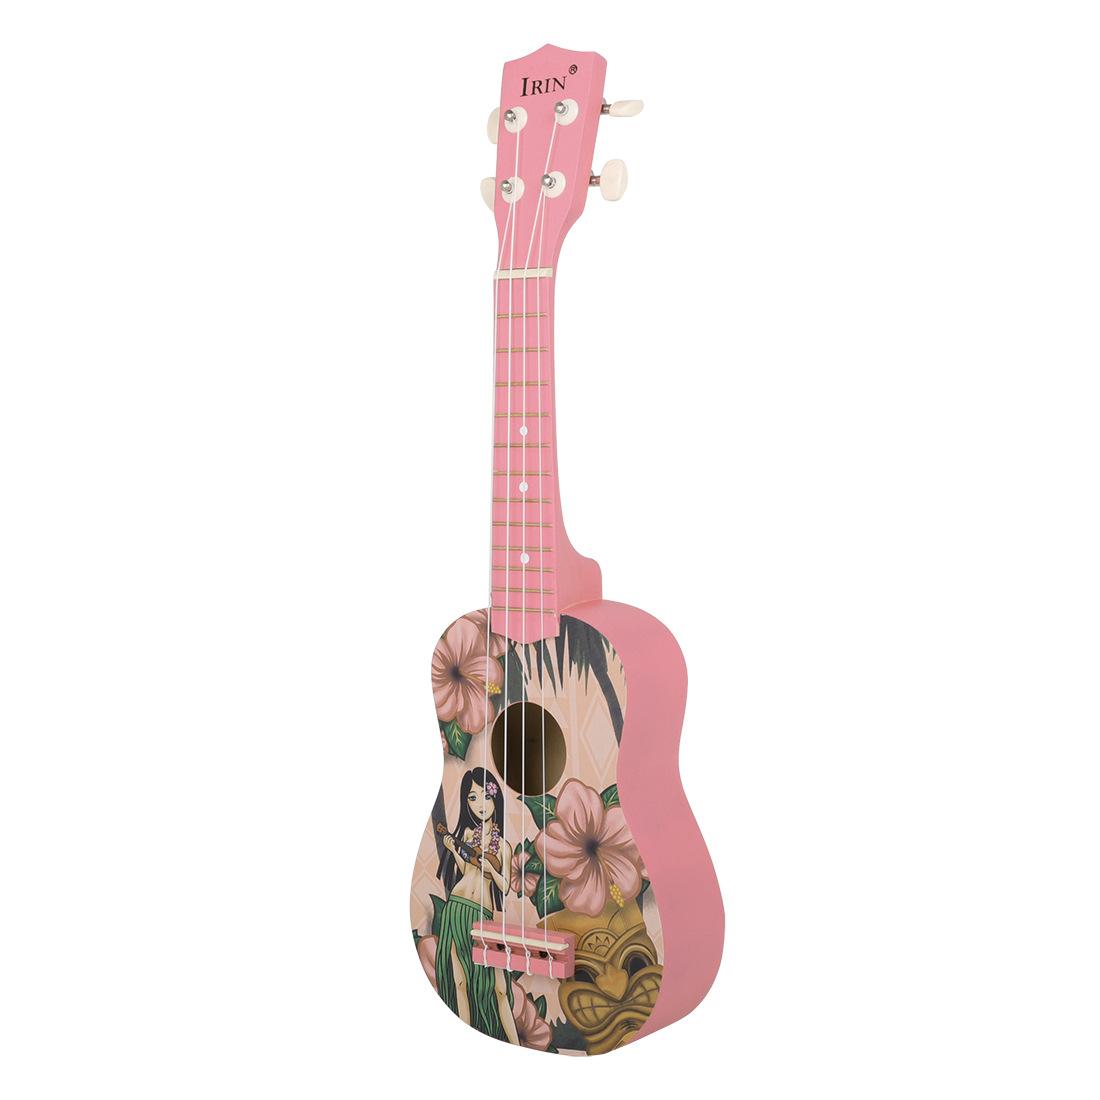 IRIN 21 Pink Inch Hawaiian Ukulele Four String Small Guitar Instrument For Girls 1